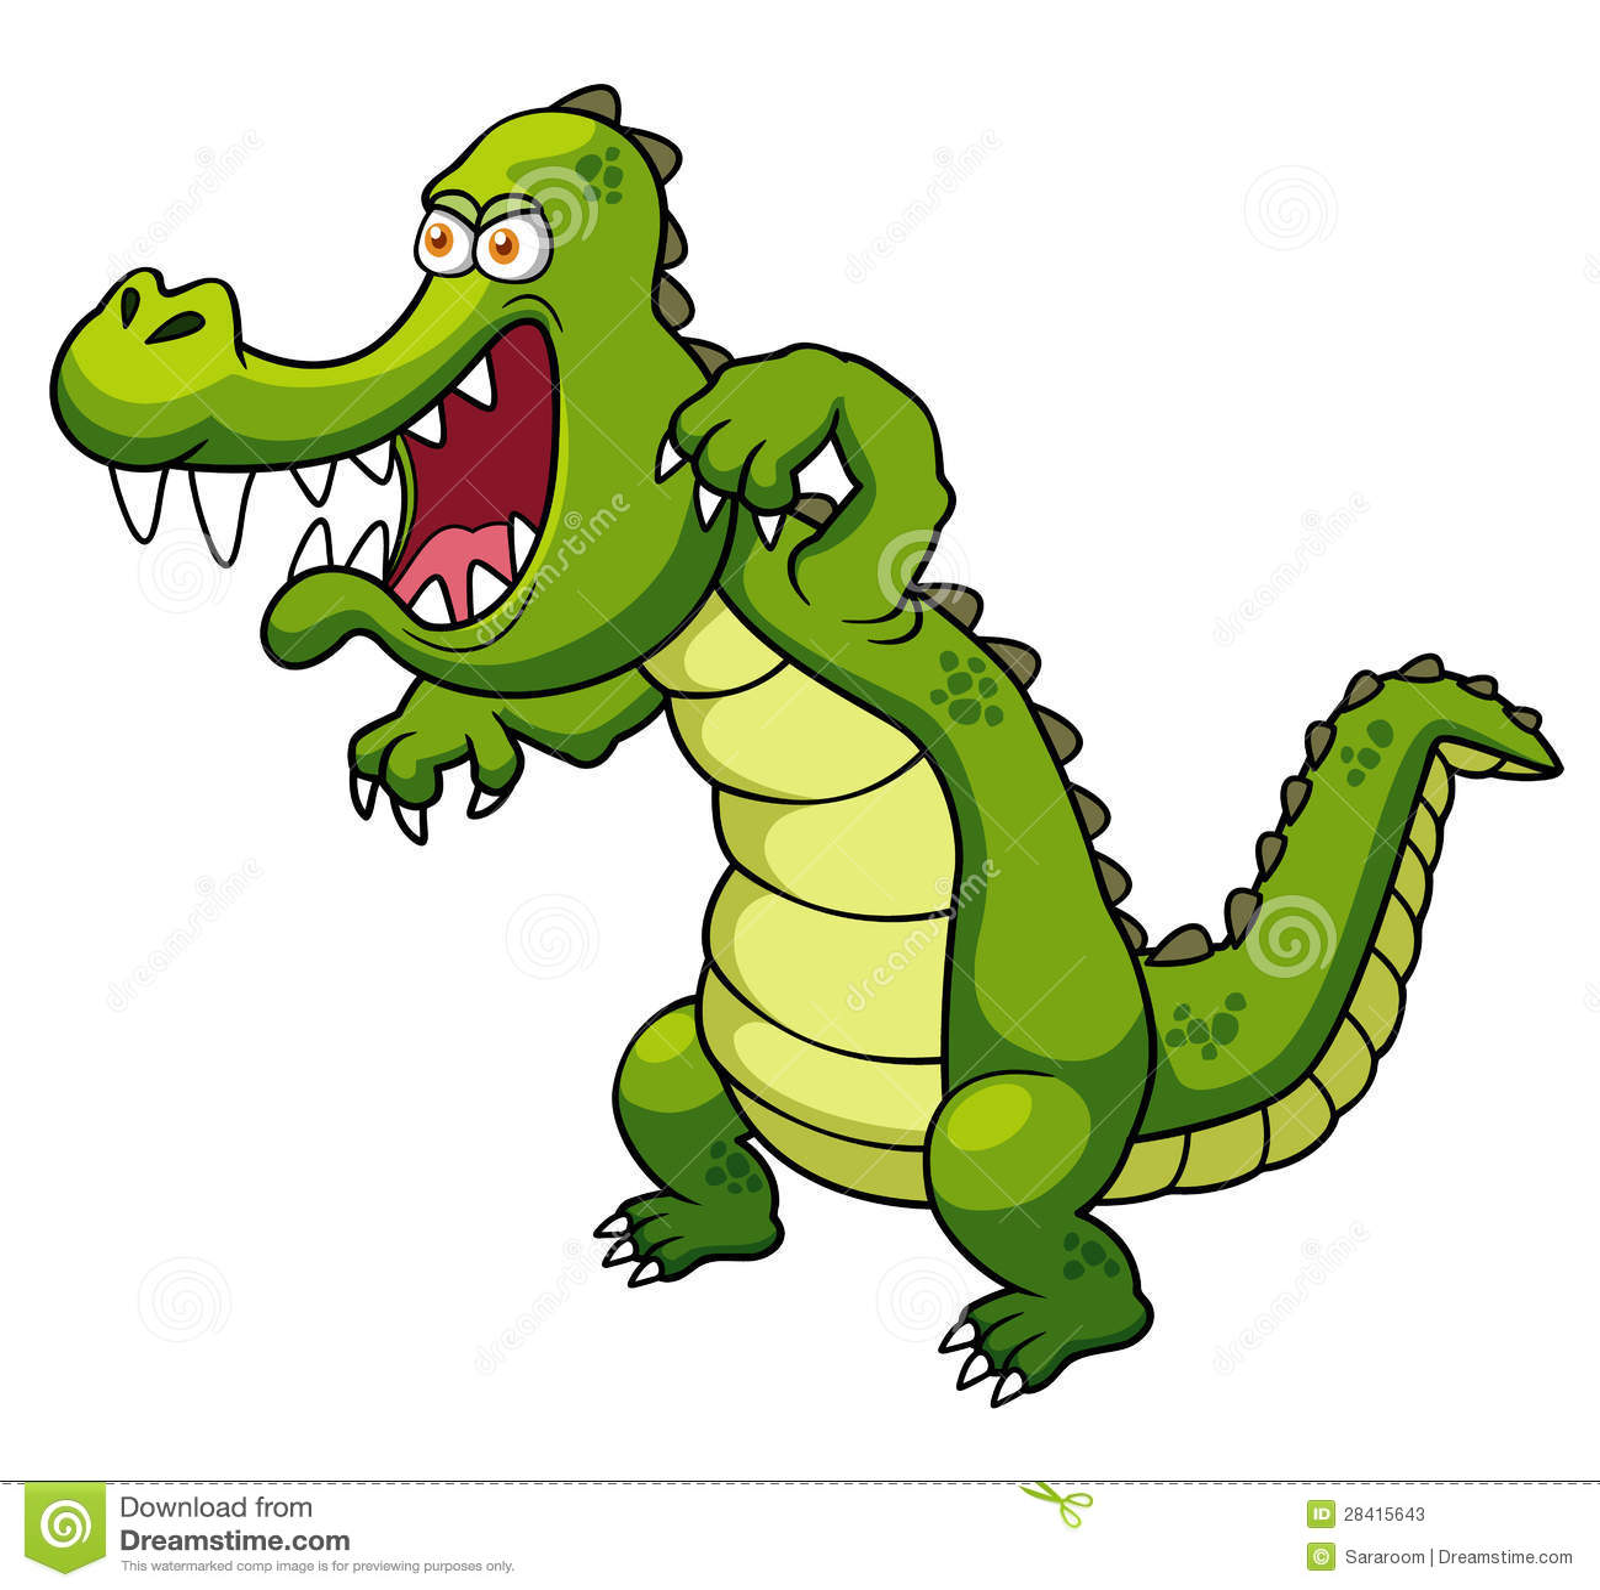 Cartoon crocodile stock vector. Illustration of crocodile ... - photo#20